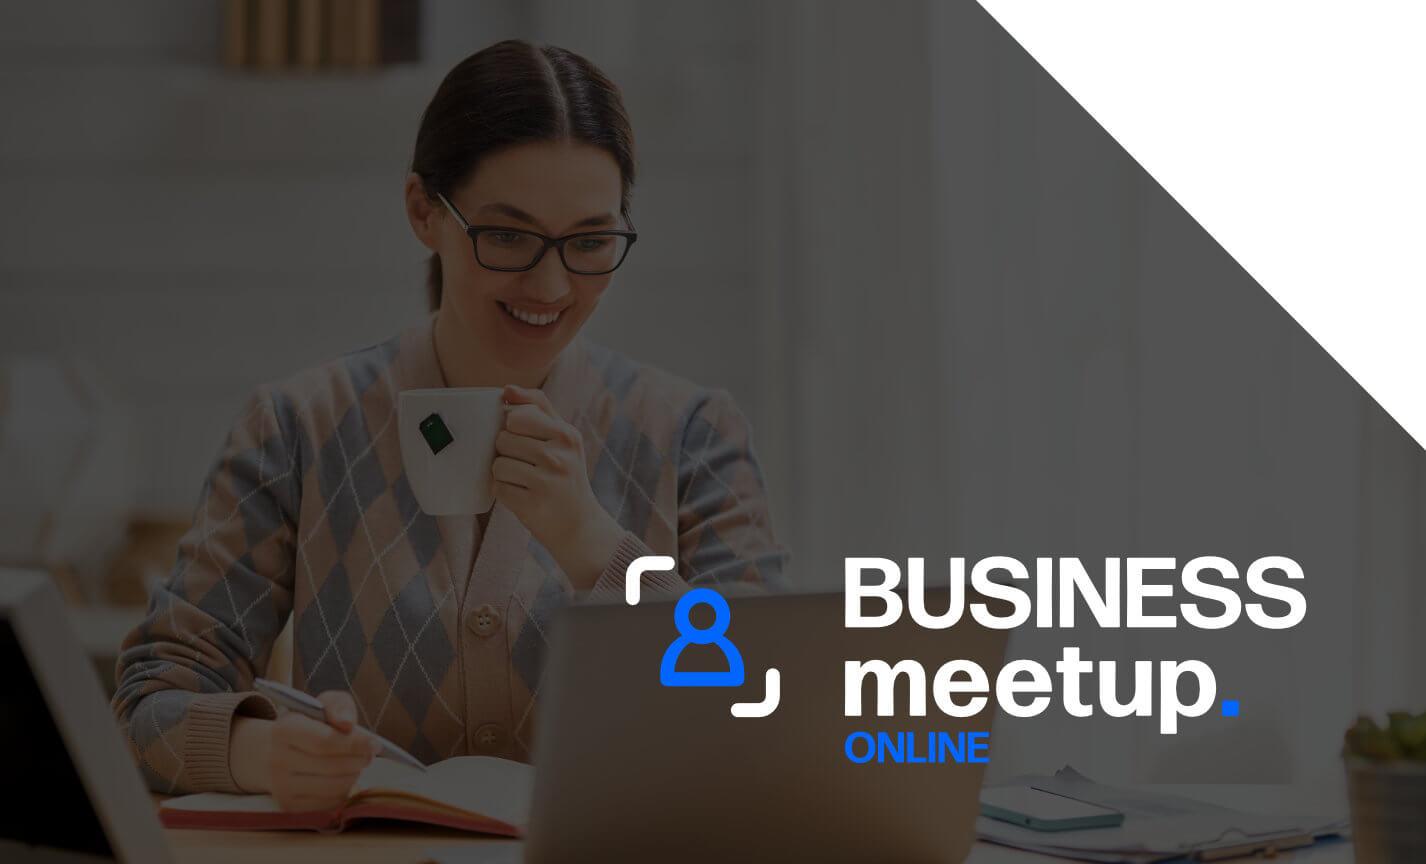 BUSINESSmeetup Gospodarka 4.0